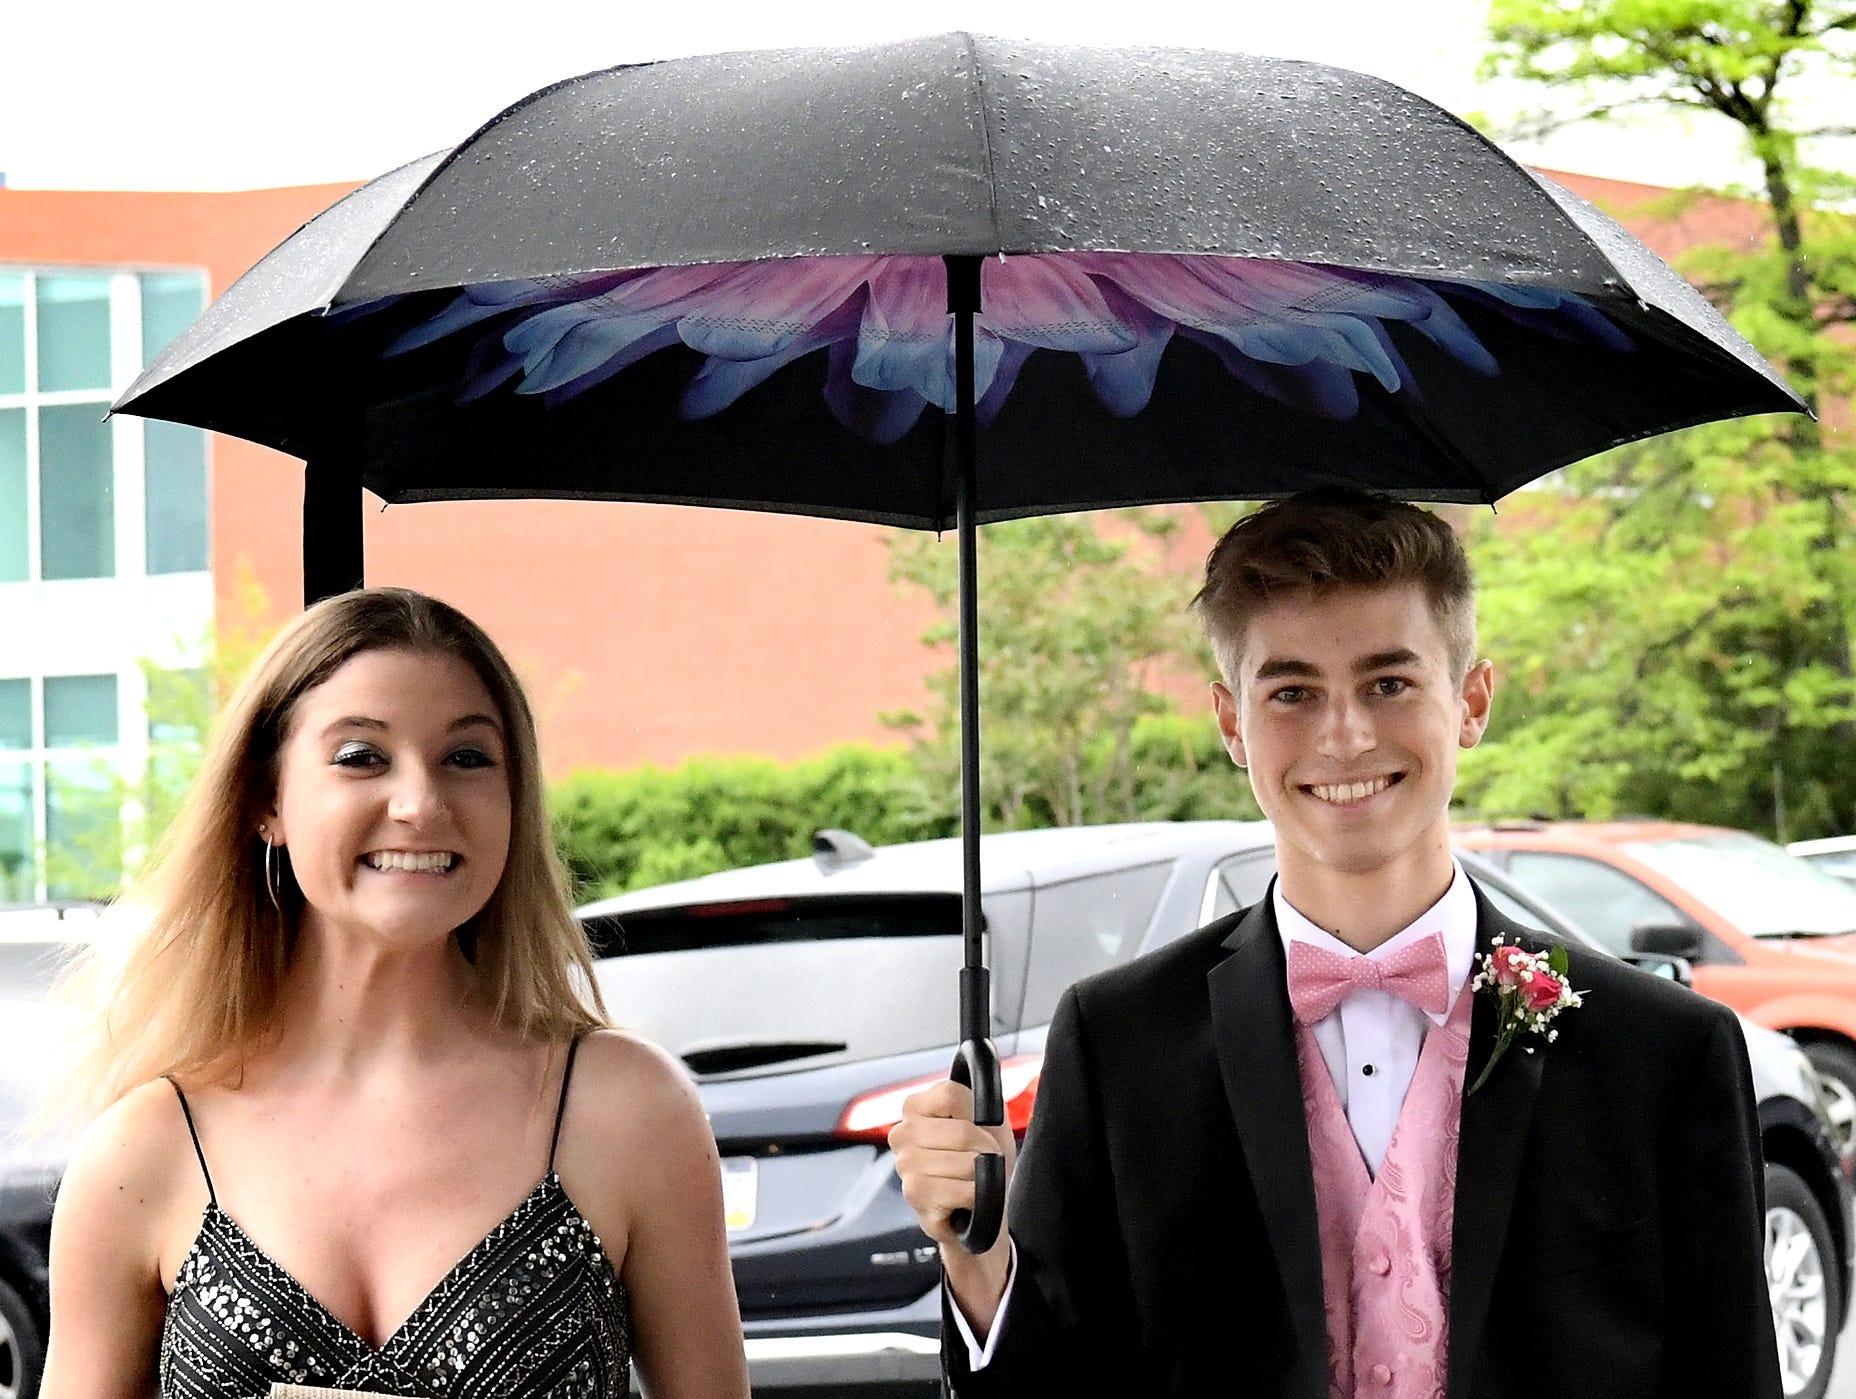 Reagan Starrett and Matthew Malhenzie arrive at the Red Land High School Prom at Red Lion Hotel in Harrisburg Saturday, May 11, 2019. Bill Kalina photo